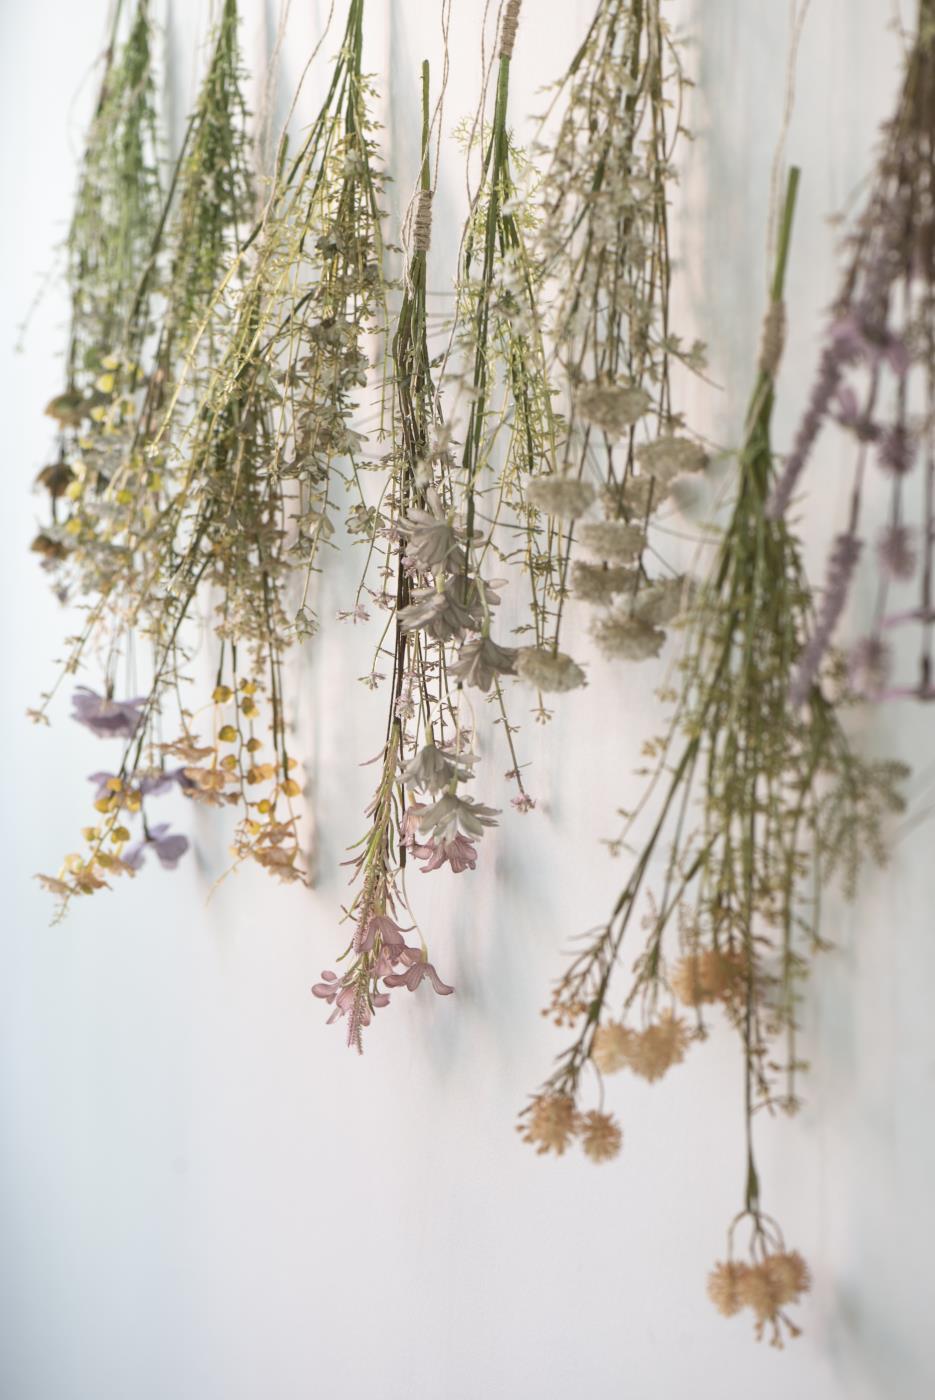 IB Laursen Kunstblumen, Bild 1